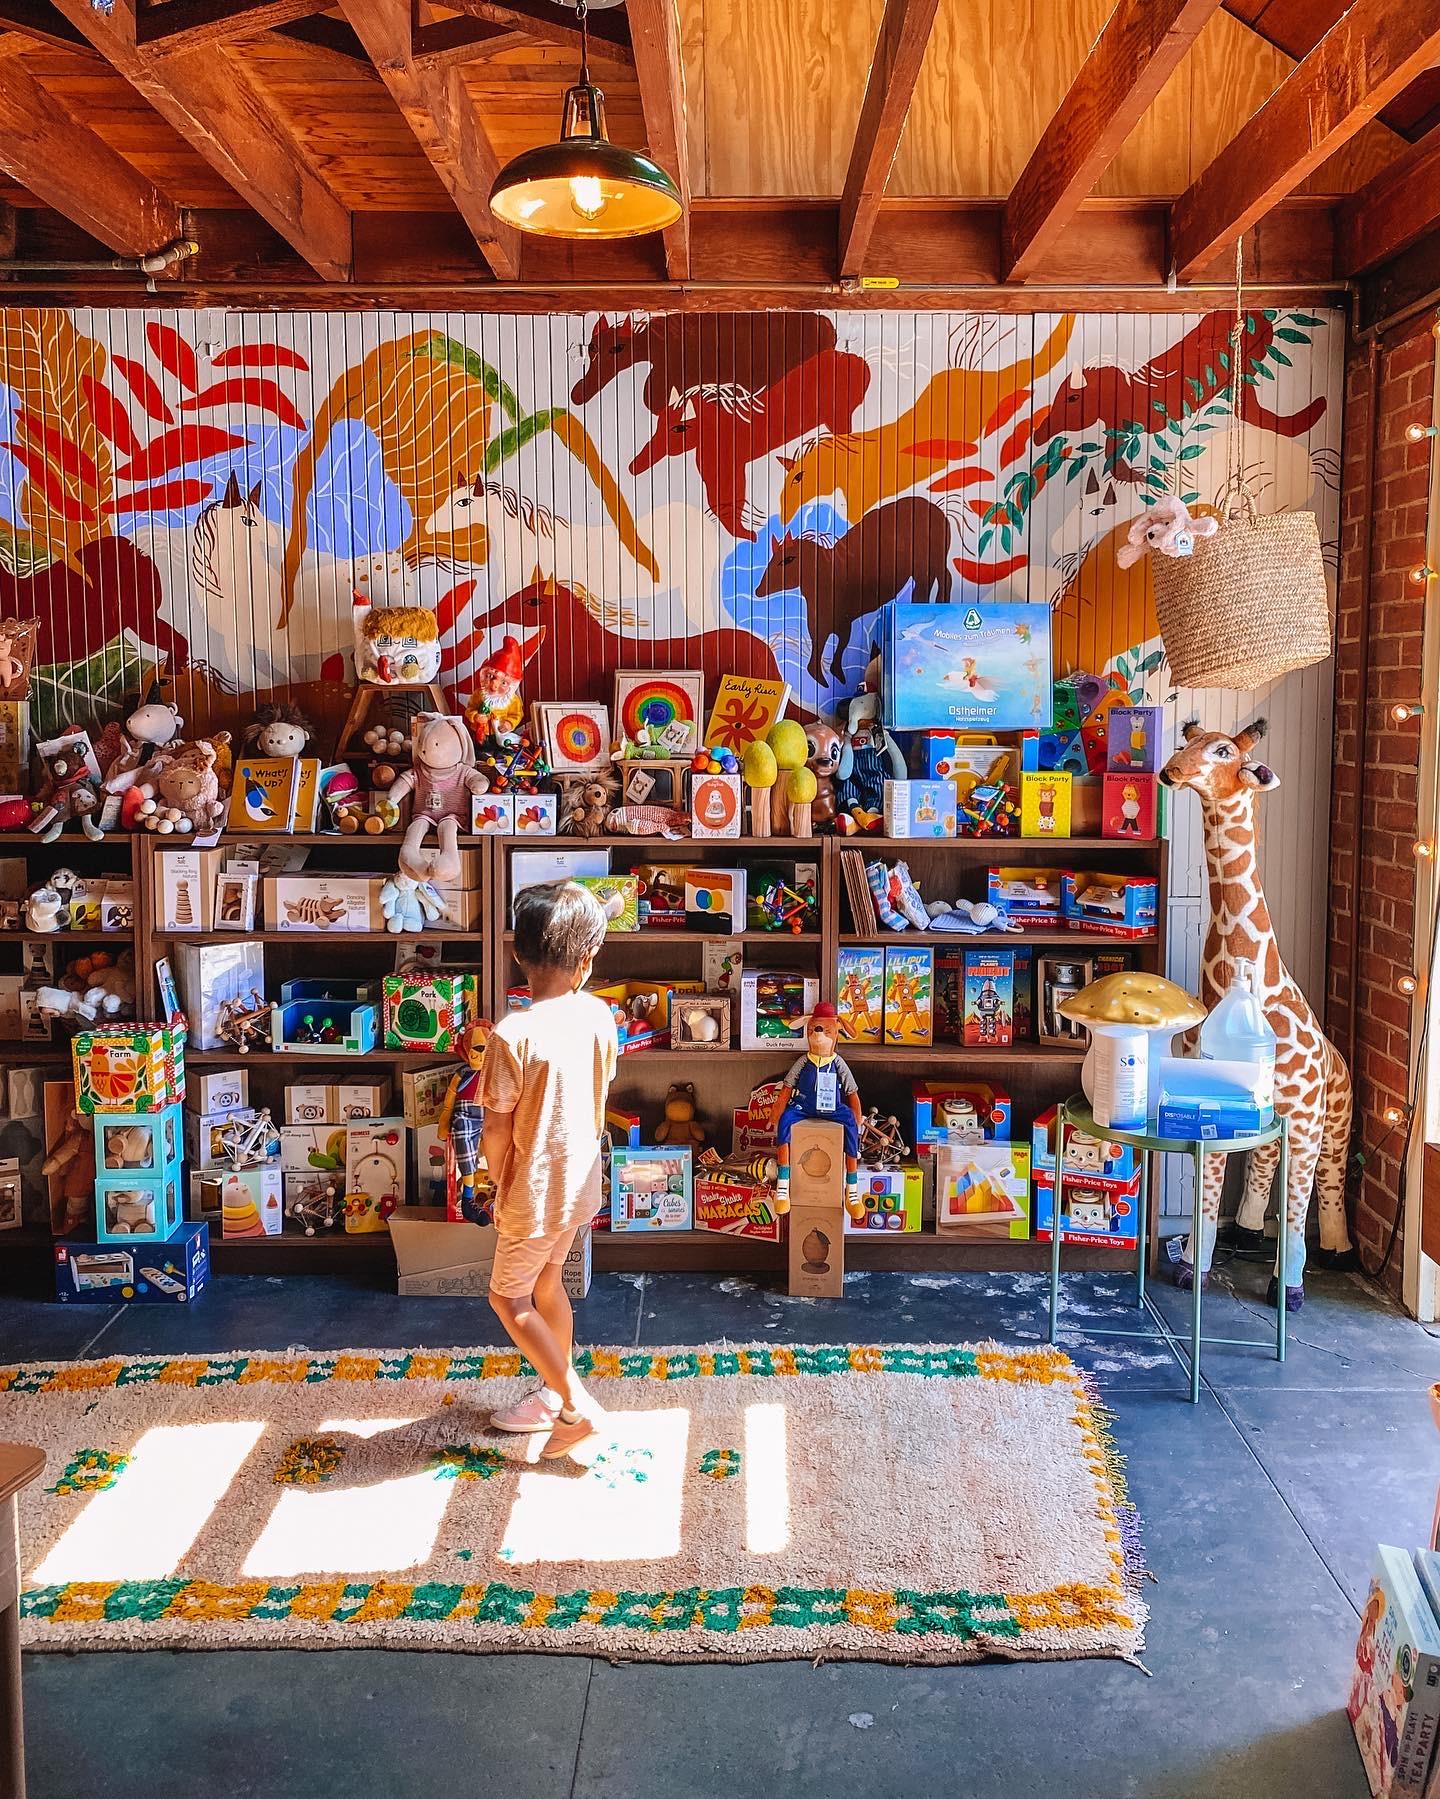 Merci Milo Toy Store in Highland Park